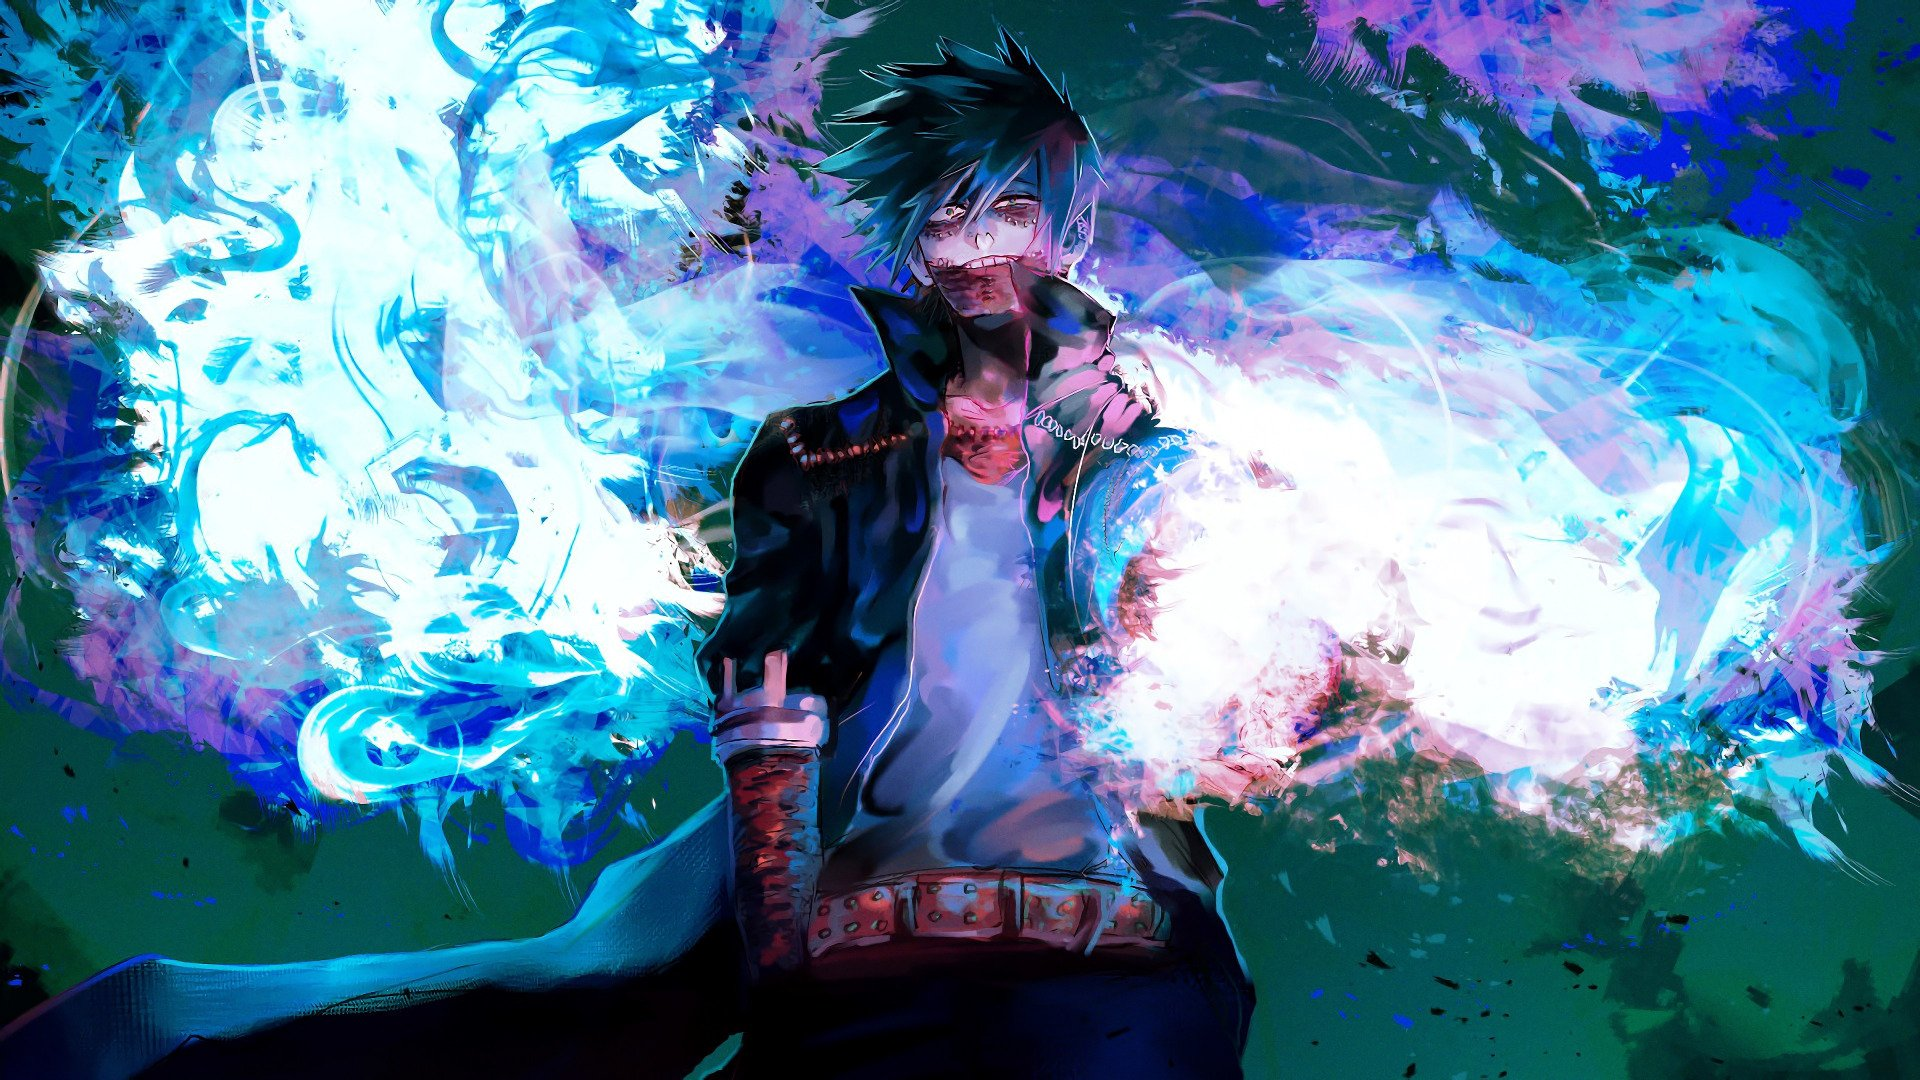 Hd dabi (boku no hero academia) wallpapers. Dabi (Boku No Hero Academia) HD Wallpaper | Background ...